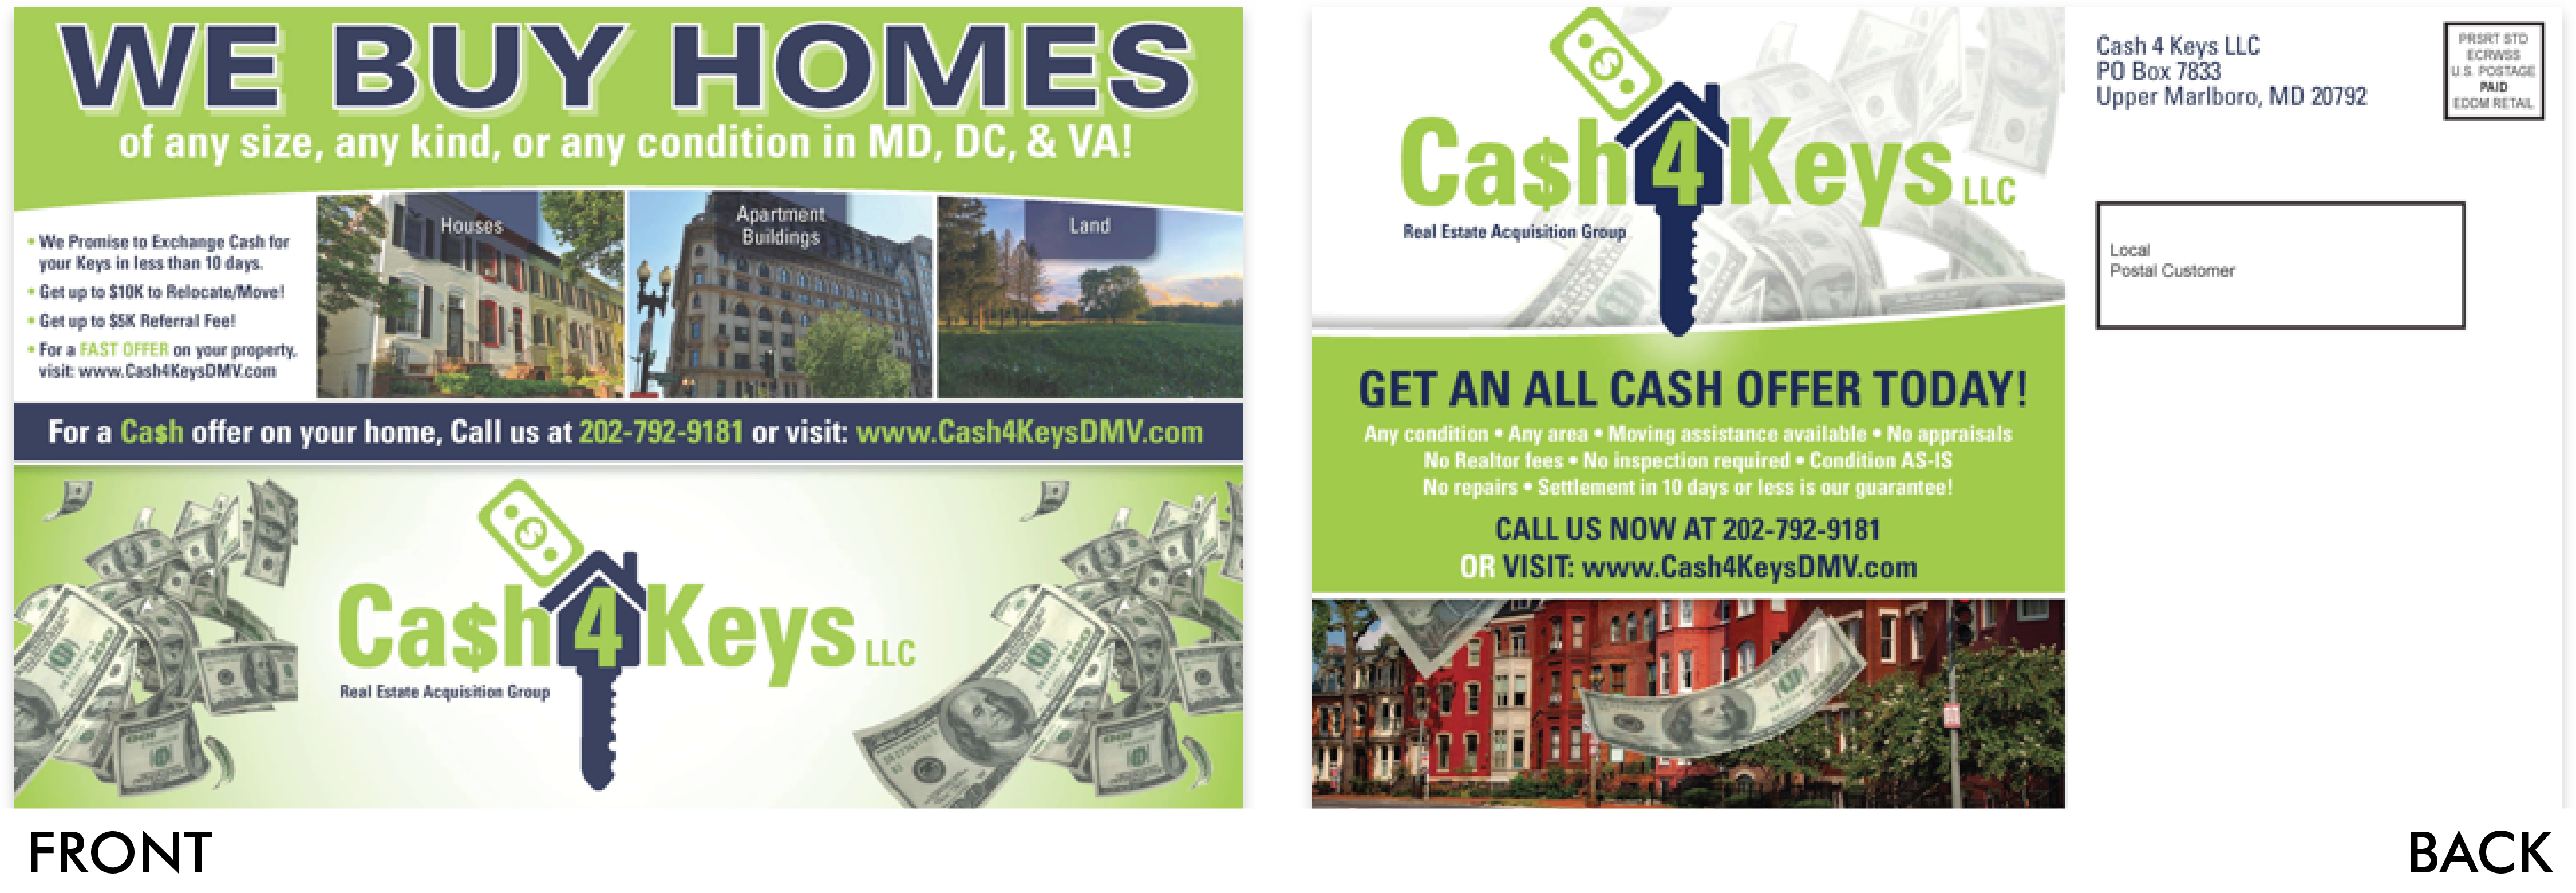 Cash4Keys Postcard